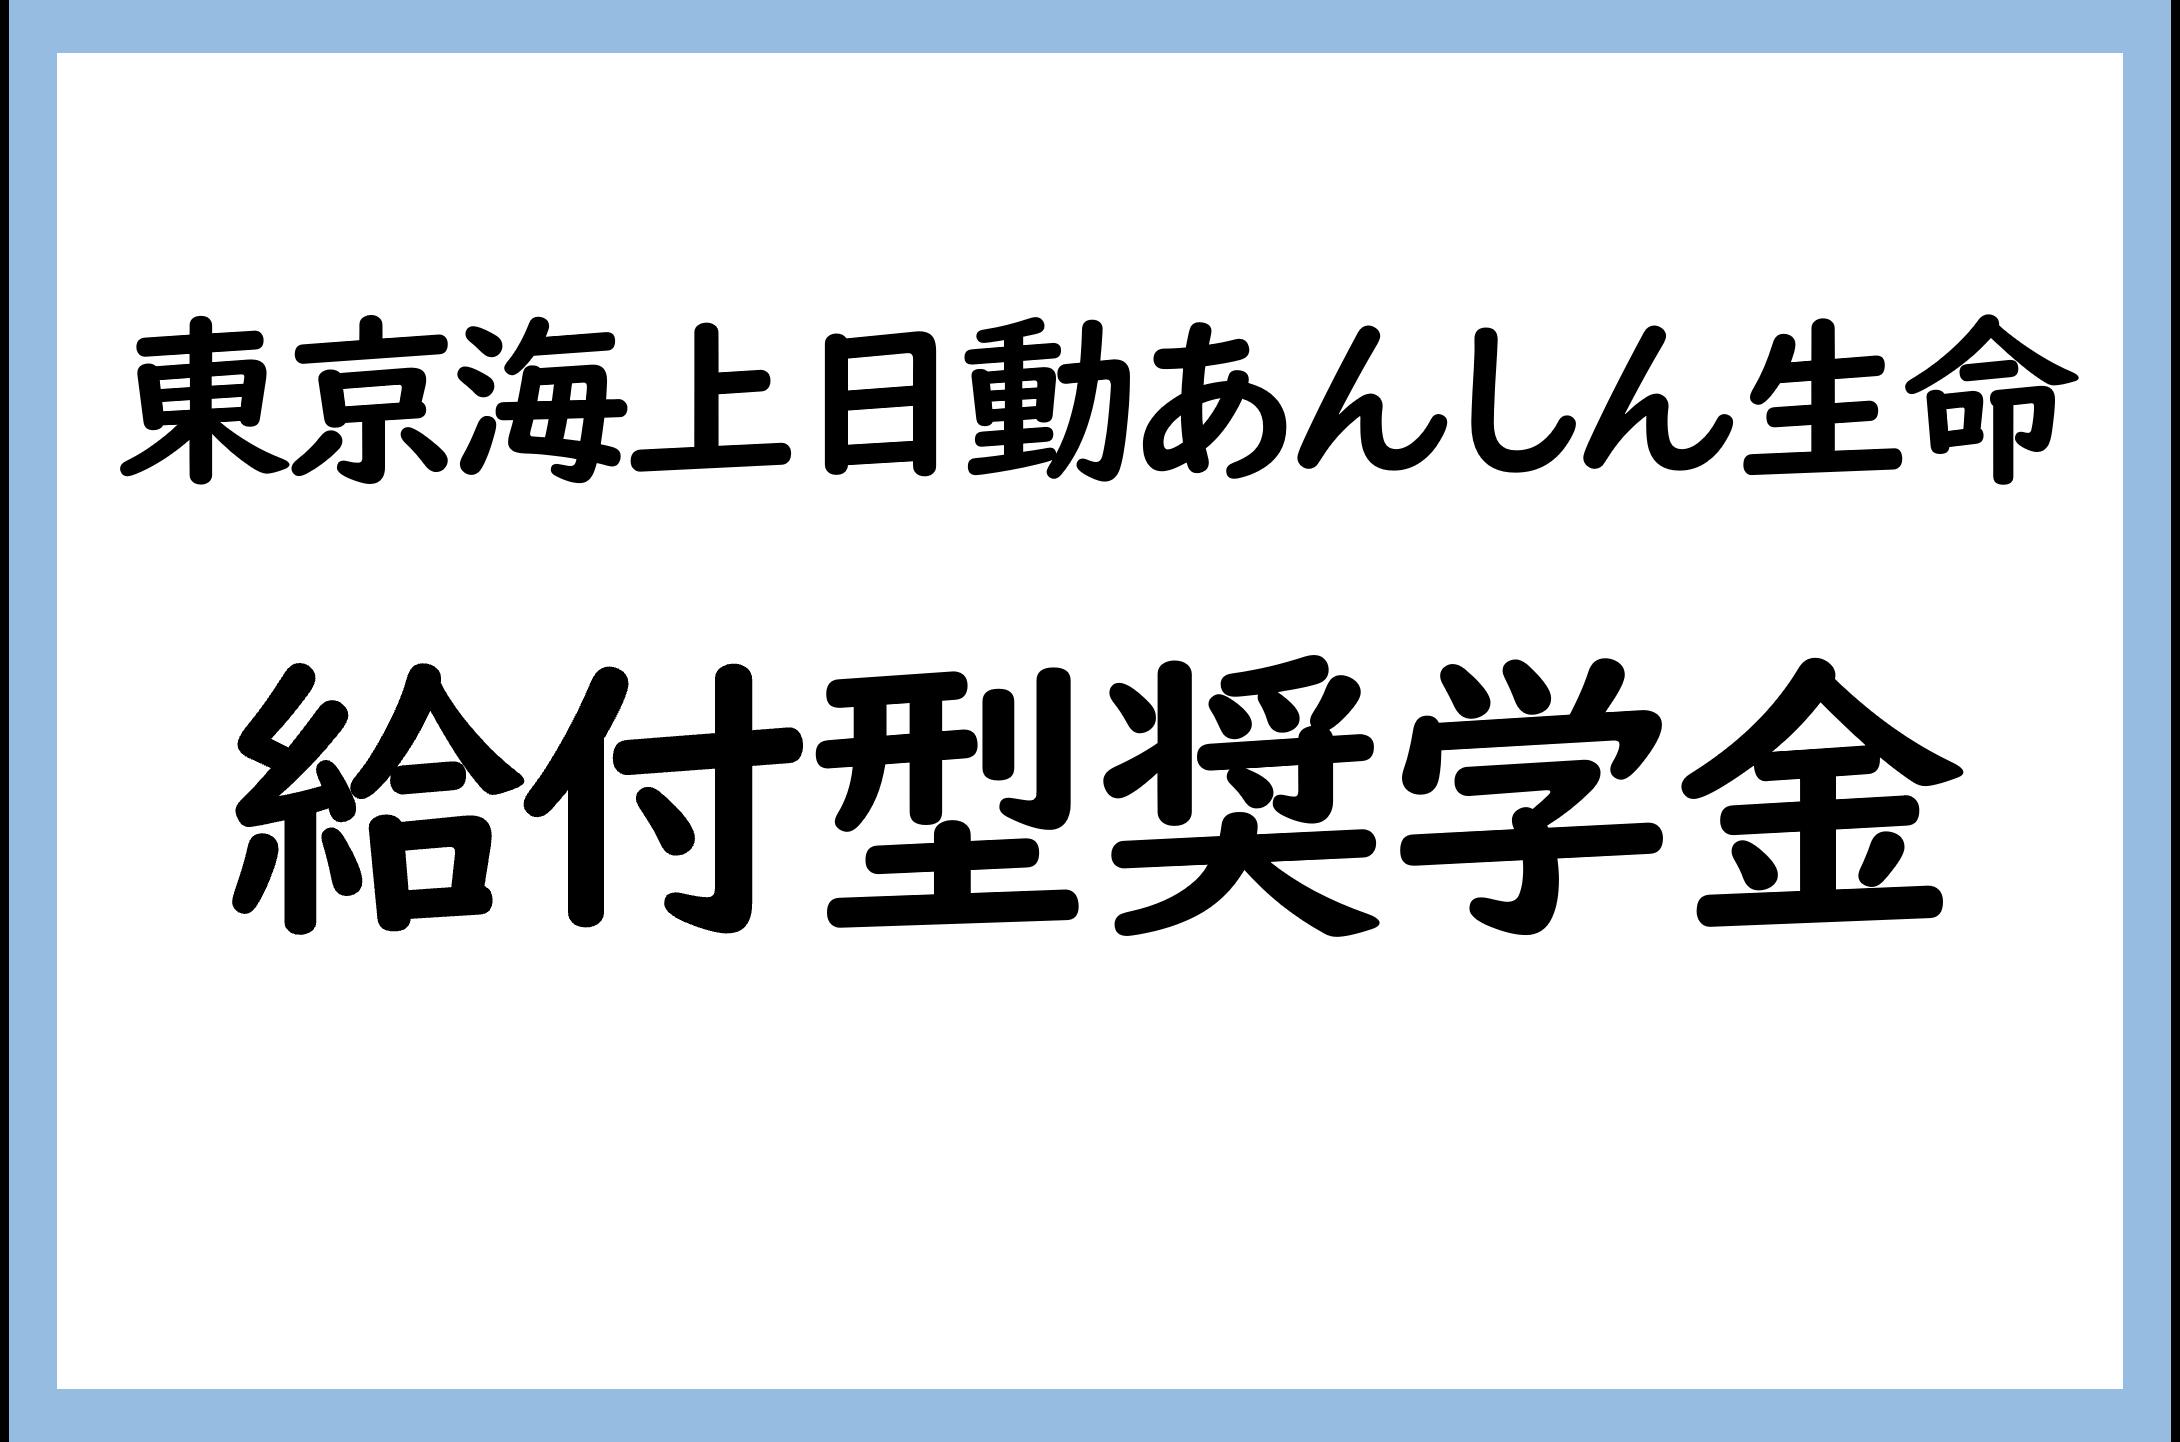 東京海上日動あんしん生命 給付型奨学金(10/29 締切 ※当日消印有効)